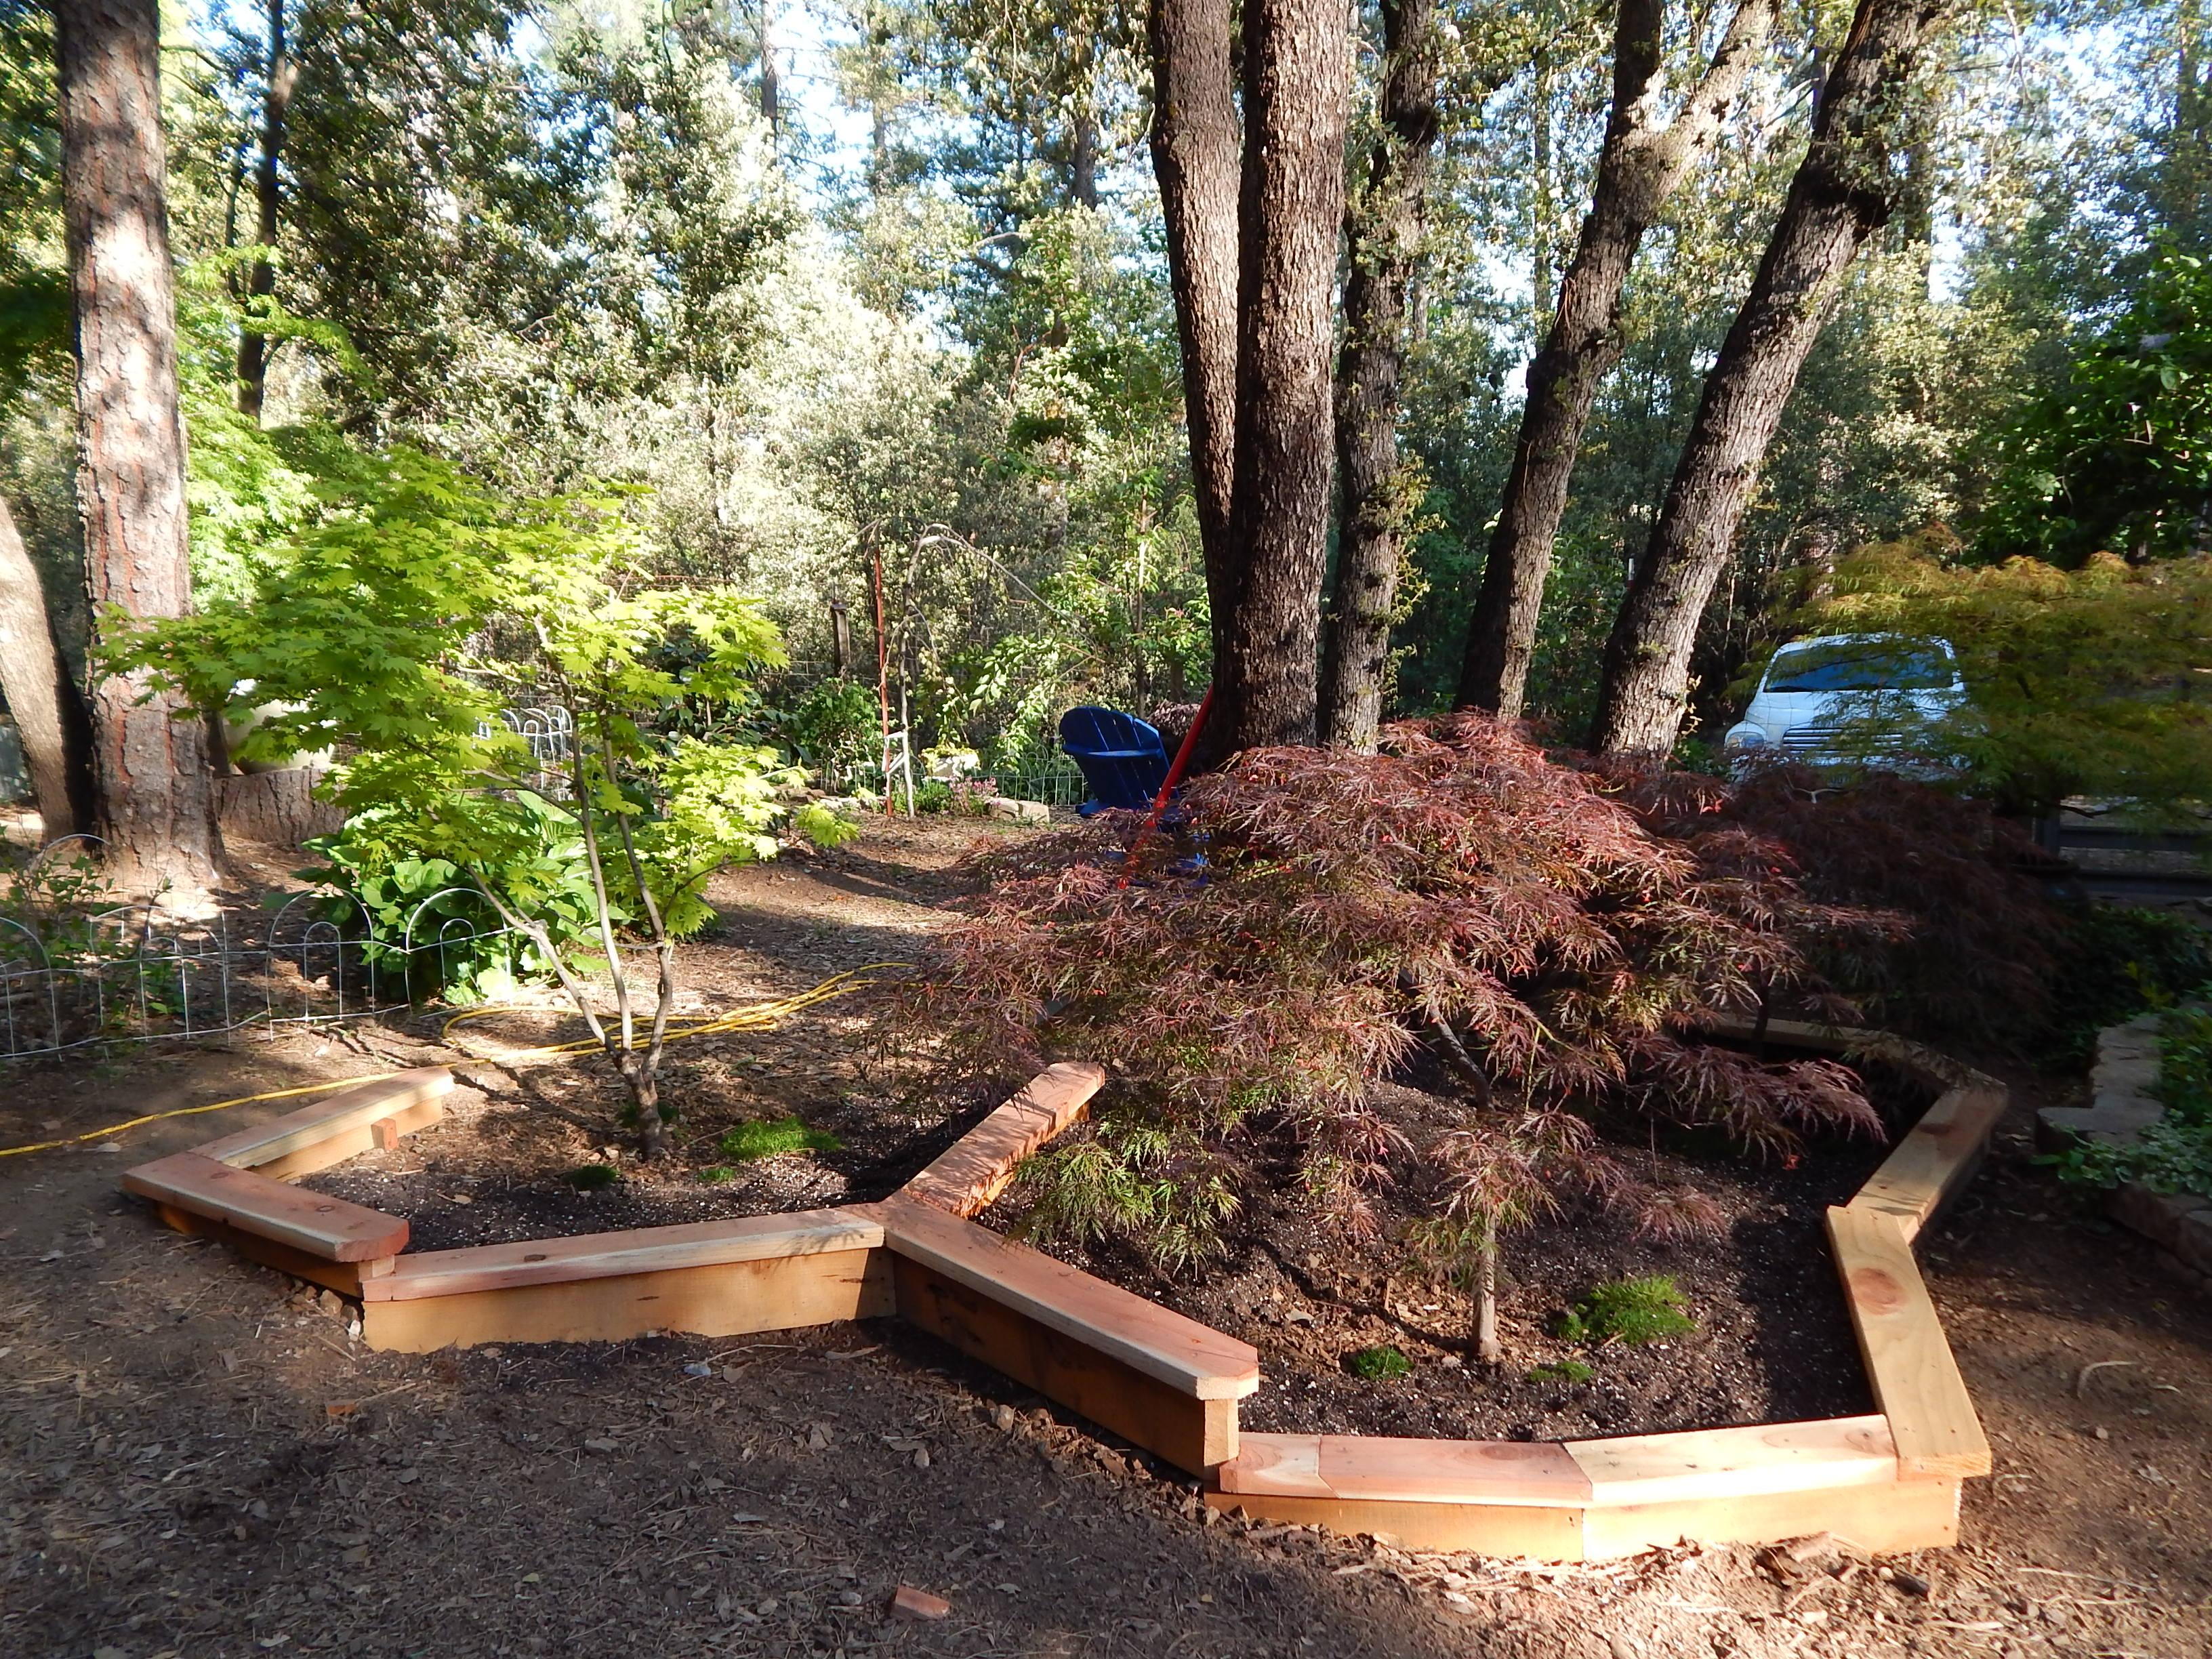 Wood Border Garden wwwgalleryhipcom The Hippest Pics